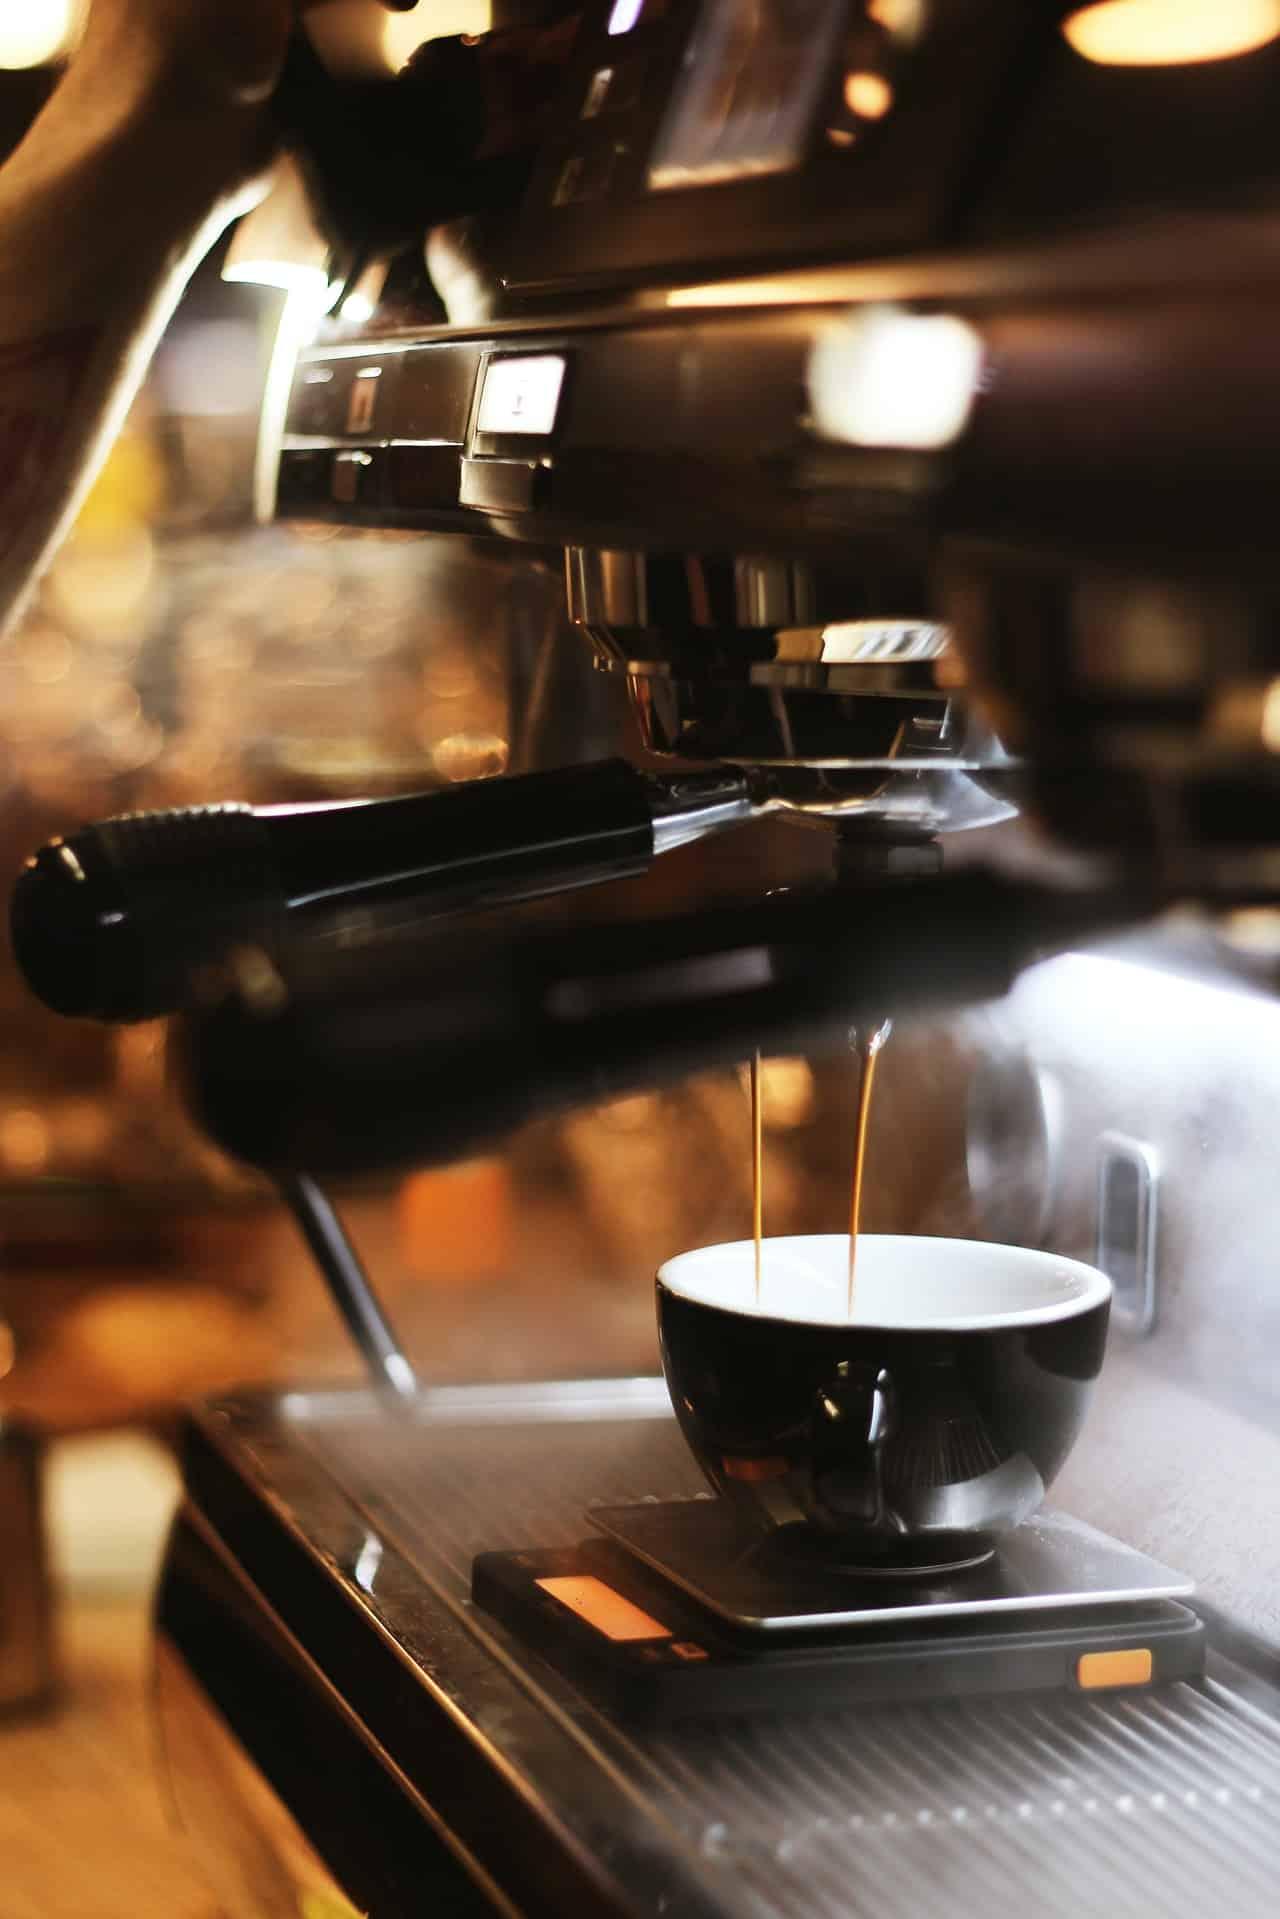 Brewing Espresso with a Coffee Machine